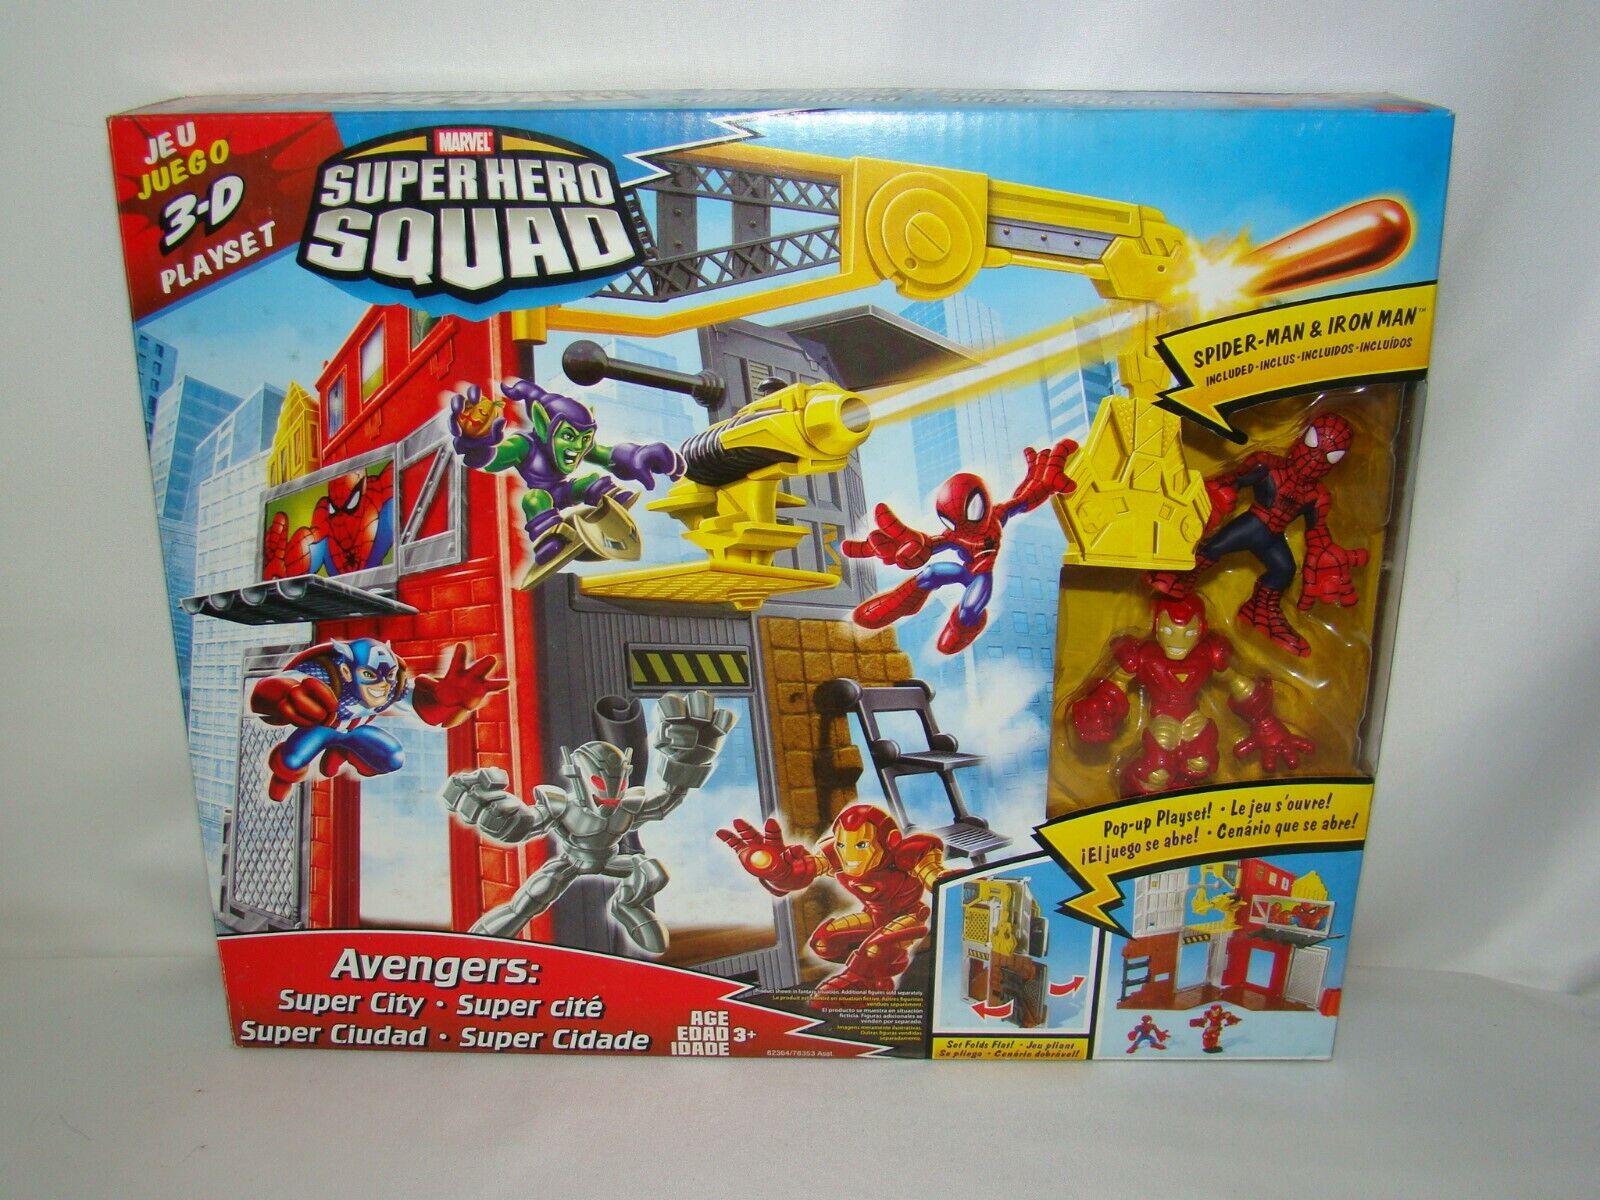 B52 súper Hero Squad Marvel Pop-Up 3D súper City Jugarset con los Vengadores Iron Man Nuevo